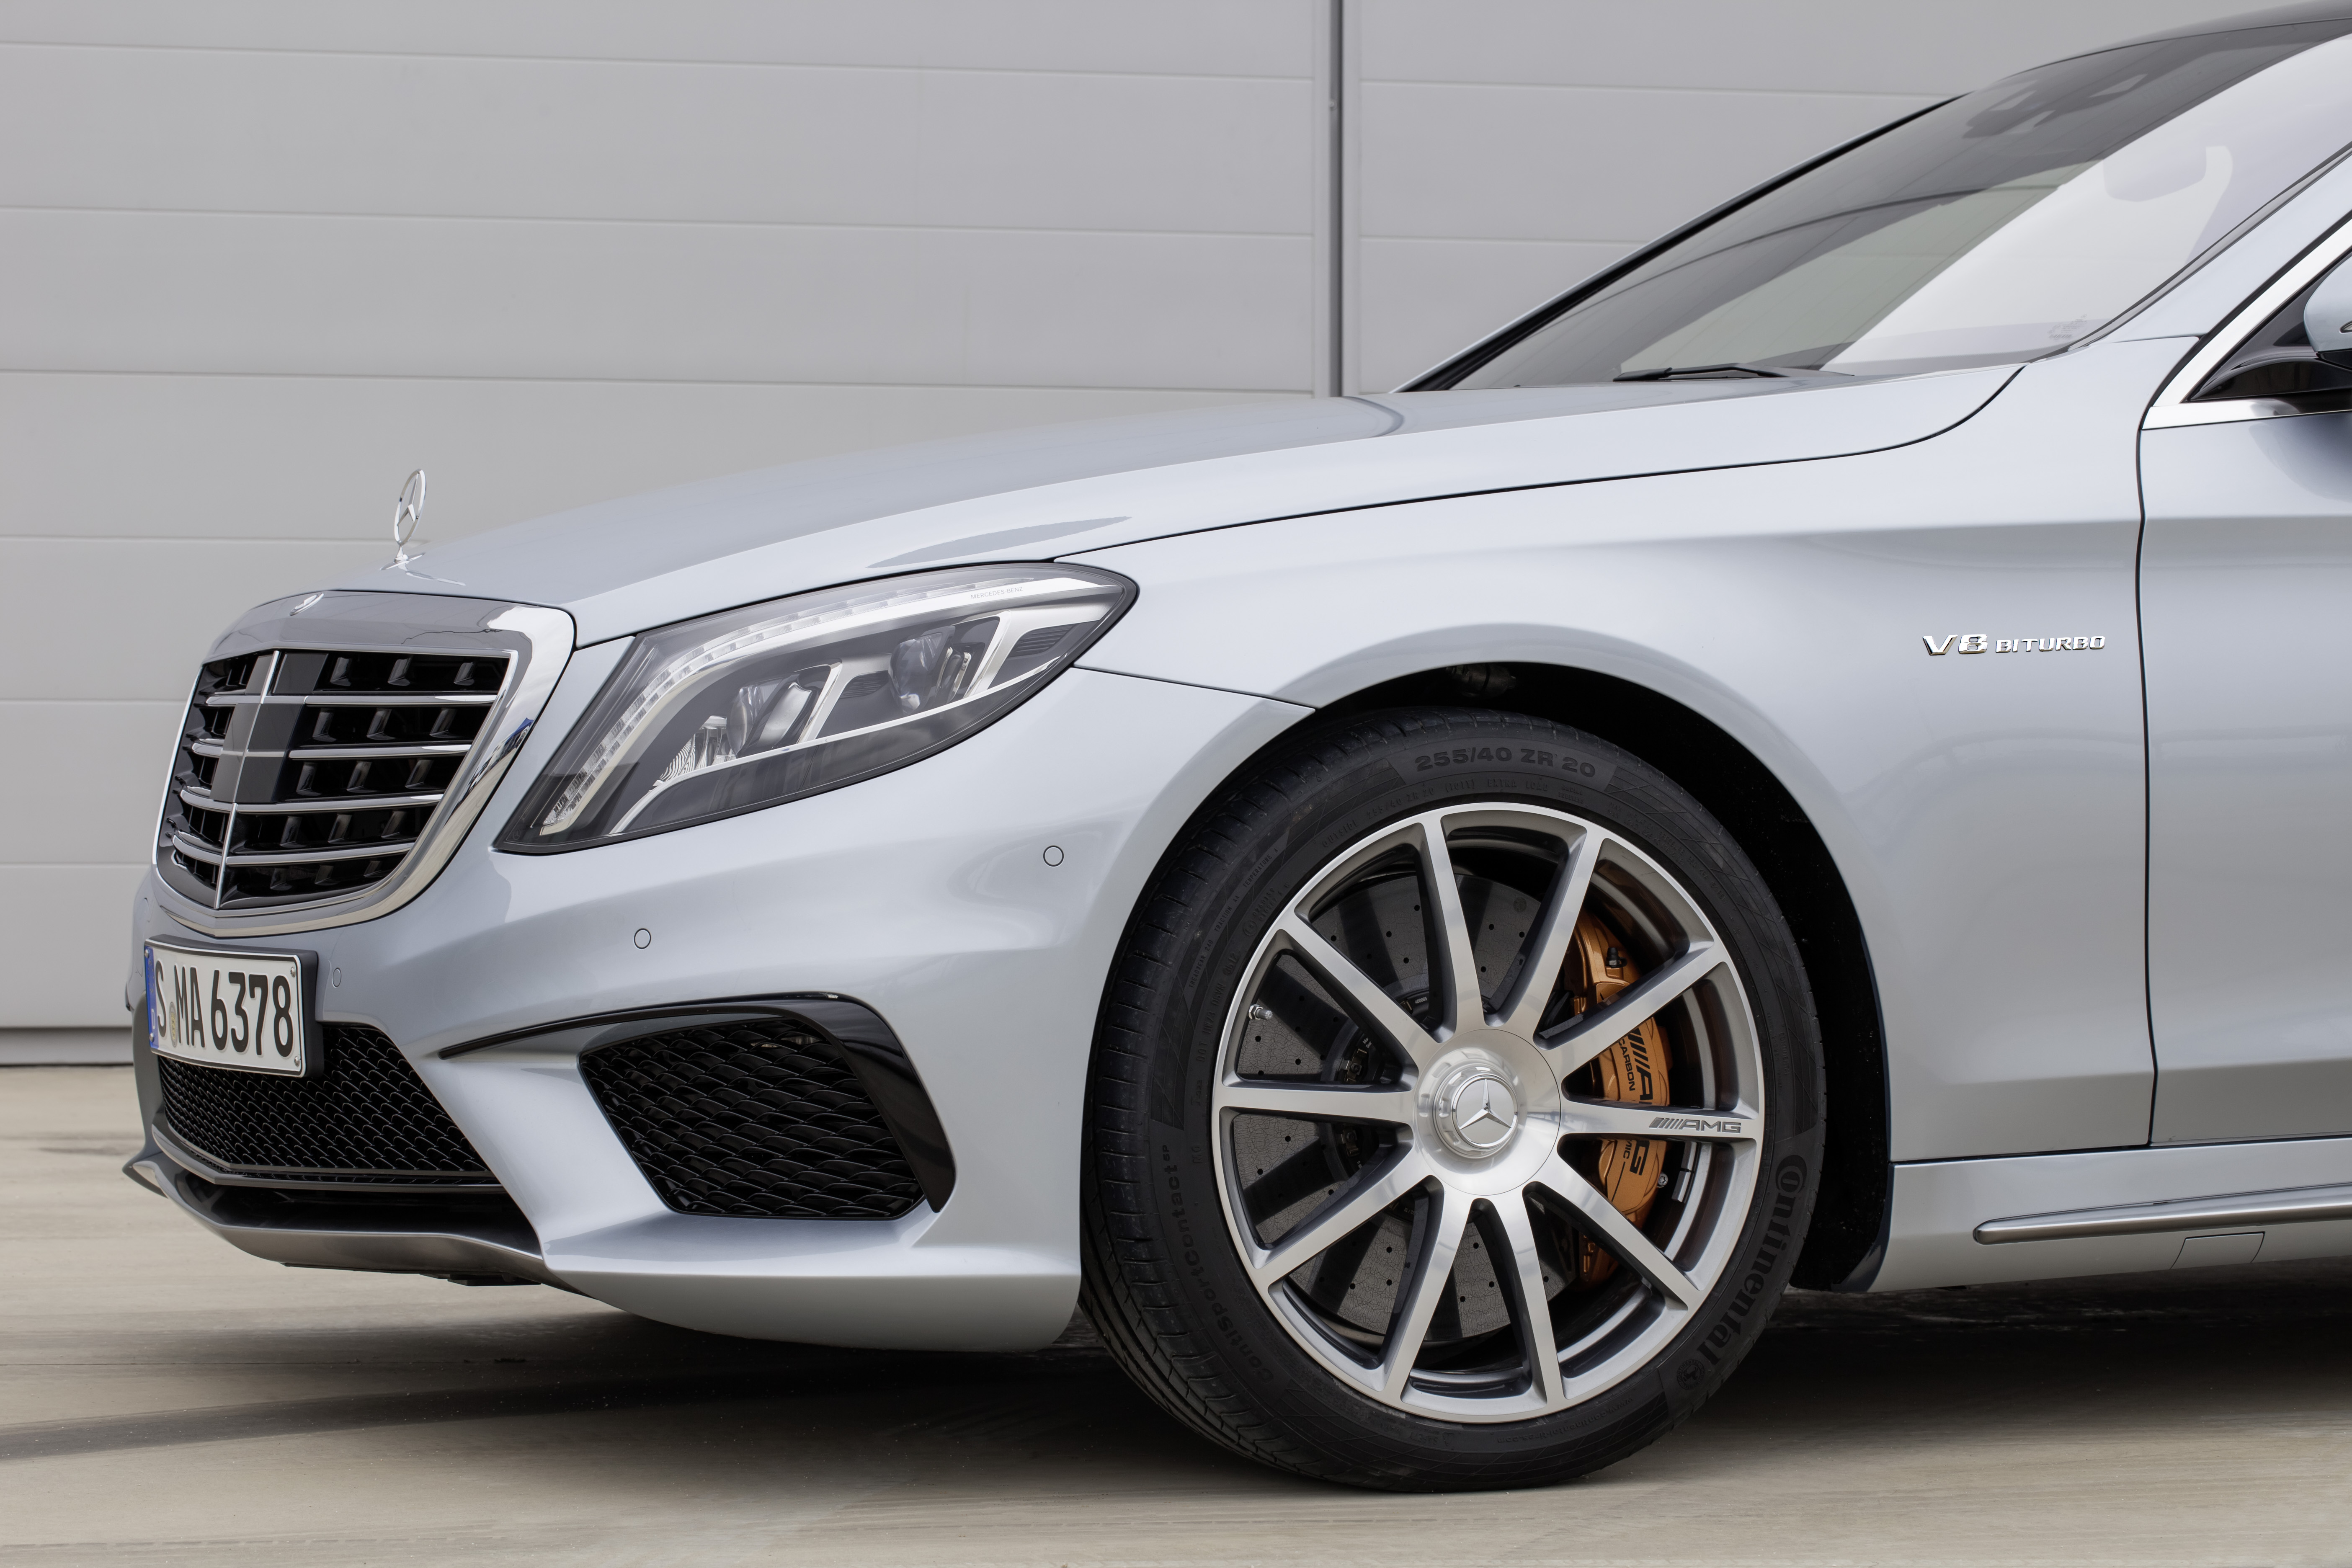 Test Drive by Davidich. BRABUS Mercedes S63 AMG W222 (750 HP ...